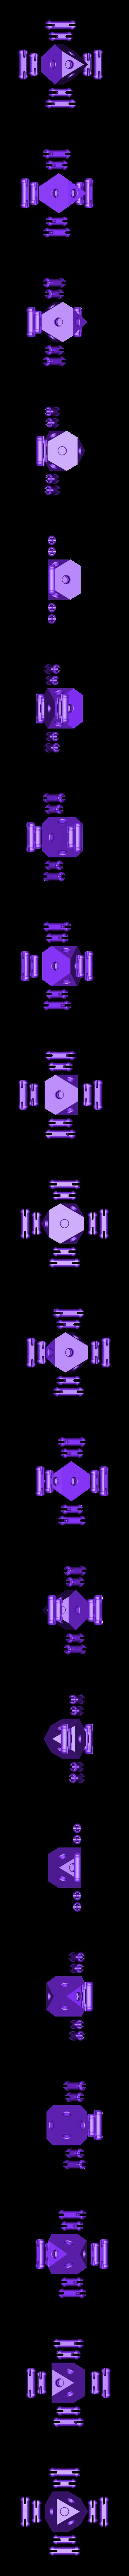 PLA-gear-heart-plate2.stl Download free STL file PLA Heart Gears for Replicator 2 • 3D printer model, Gaenarra